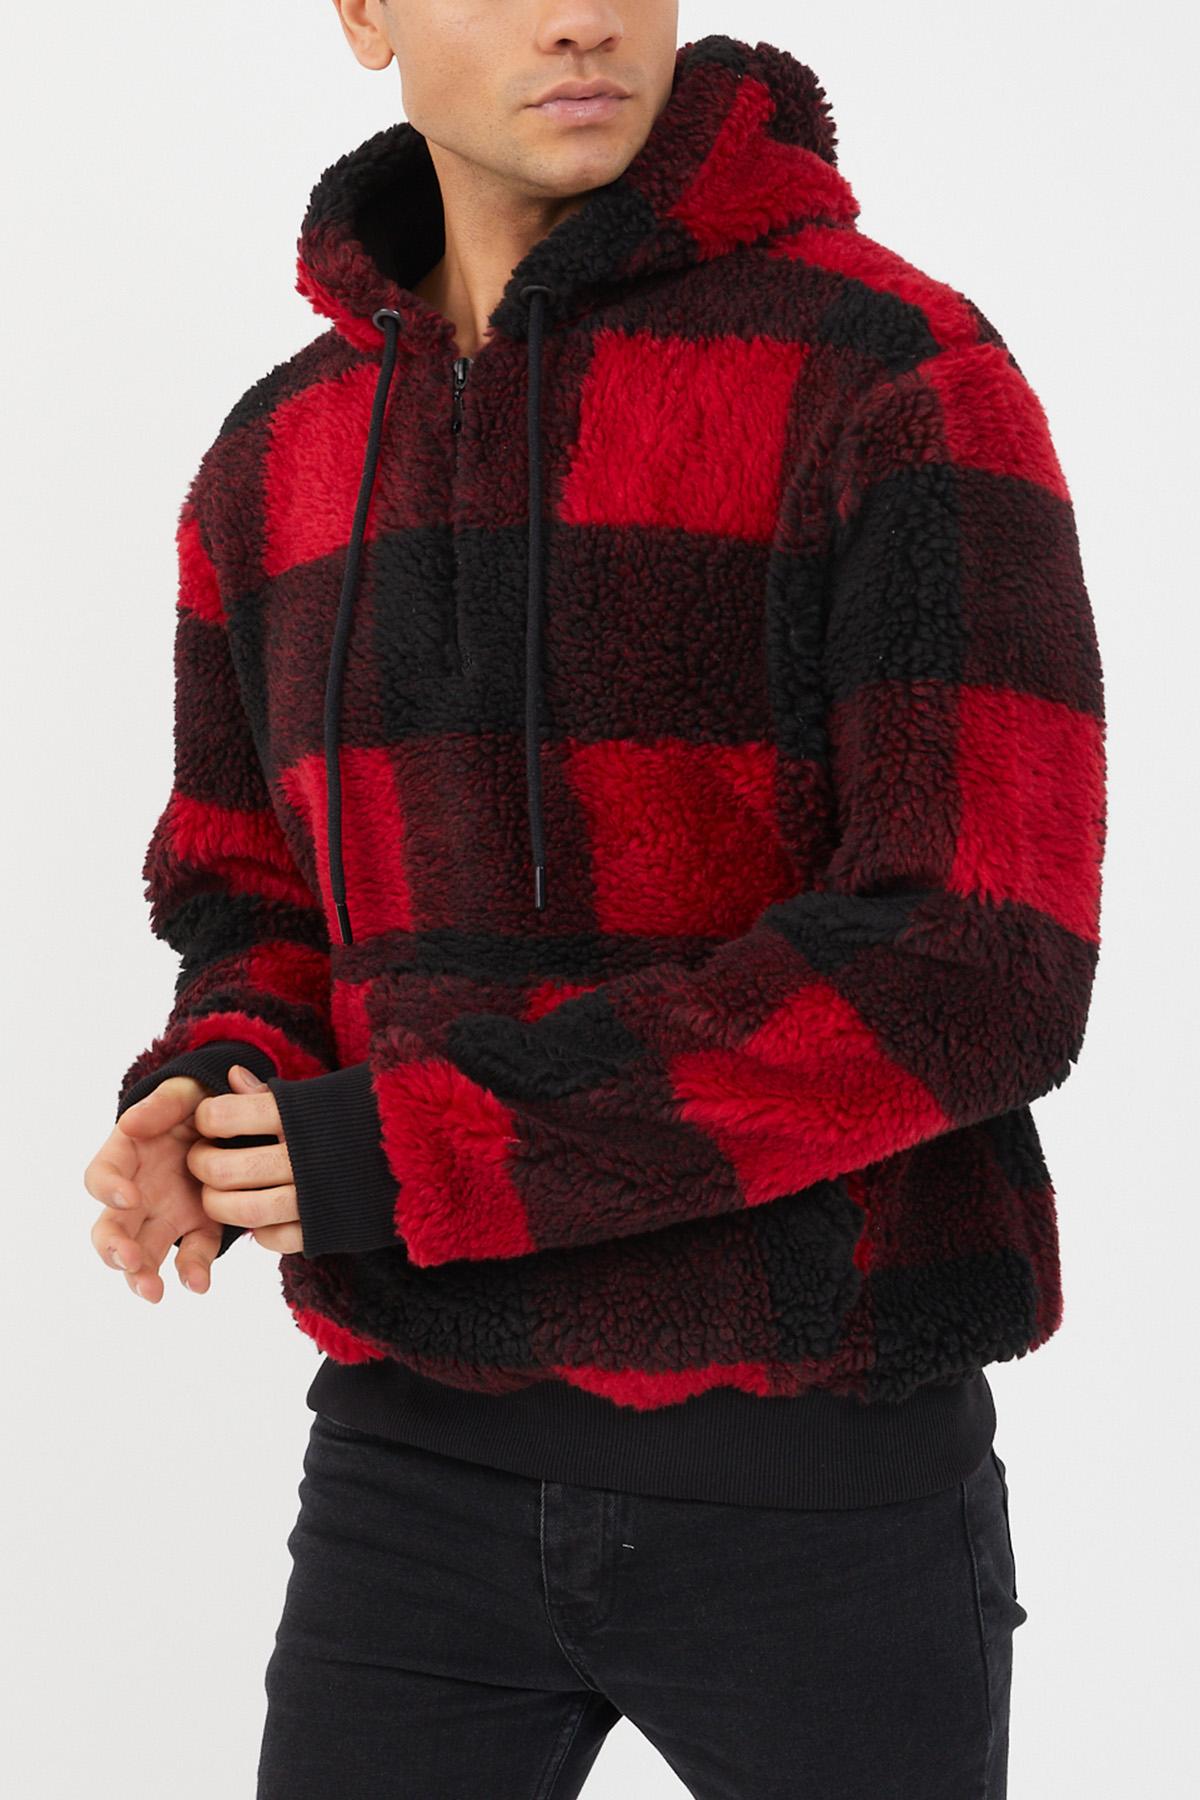 XHAN - Kırmızı Siyah Ekoseli Peluş Sweatshirt 1KXE8-44478-04